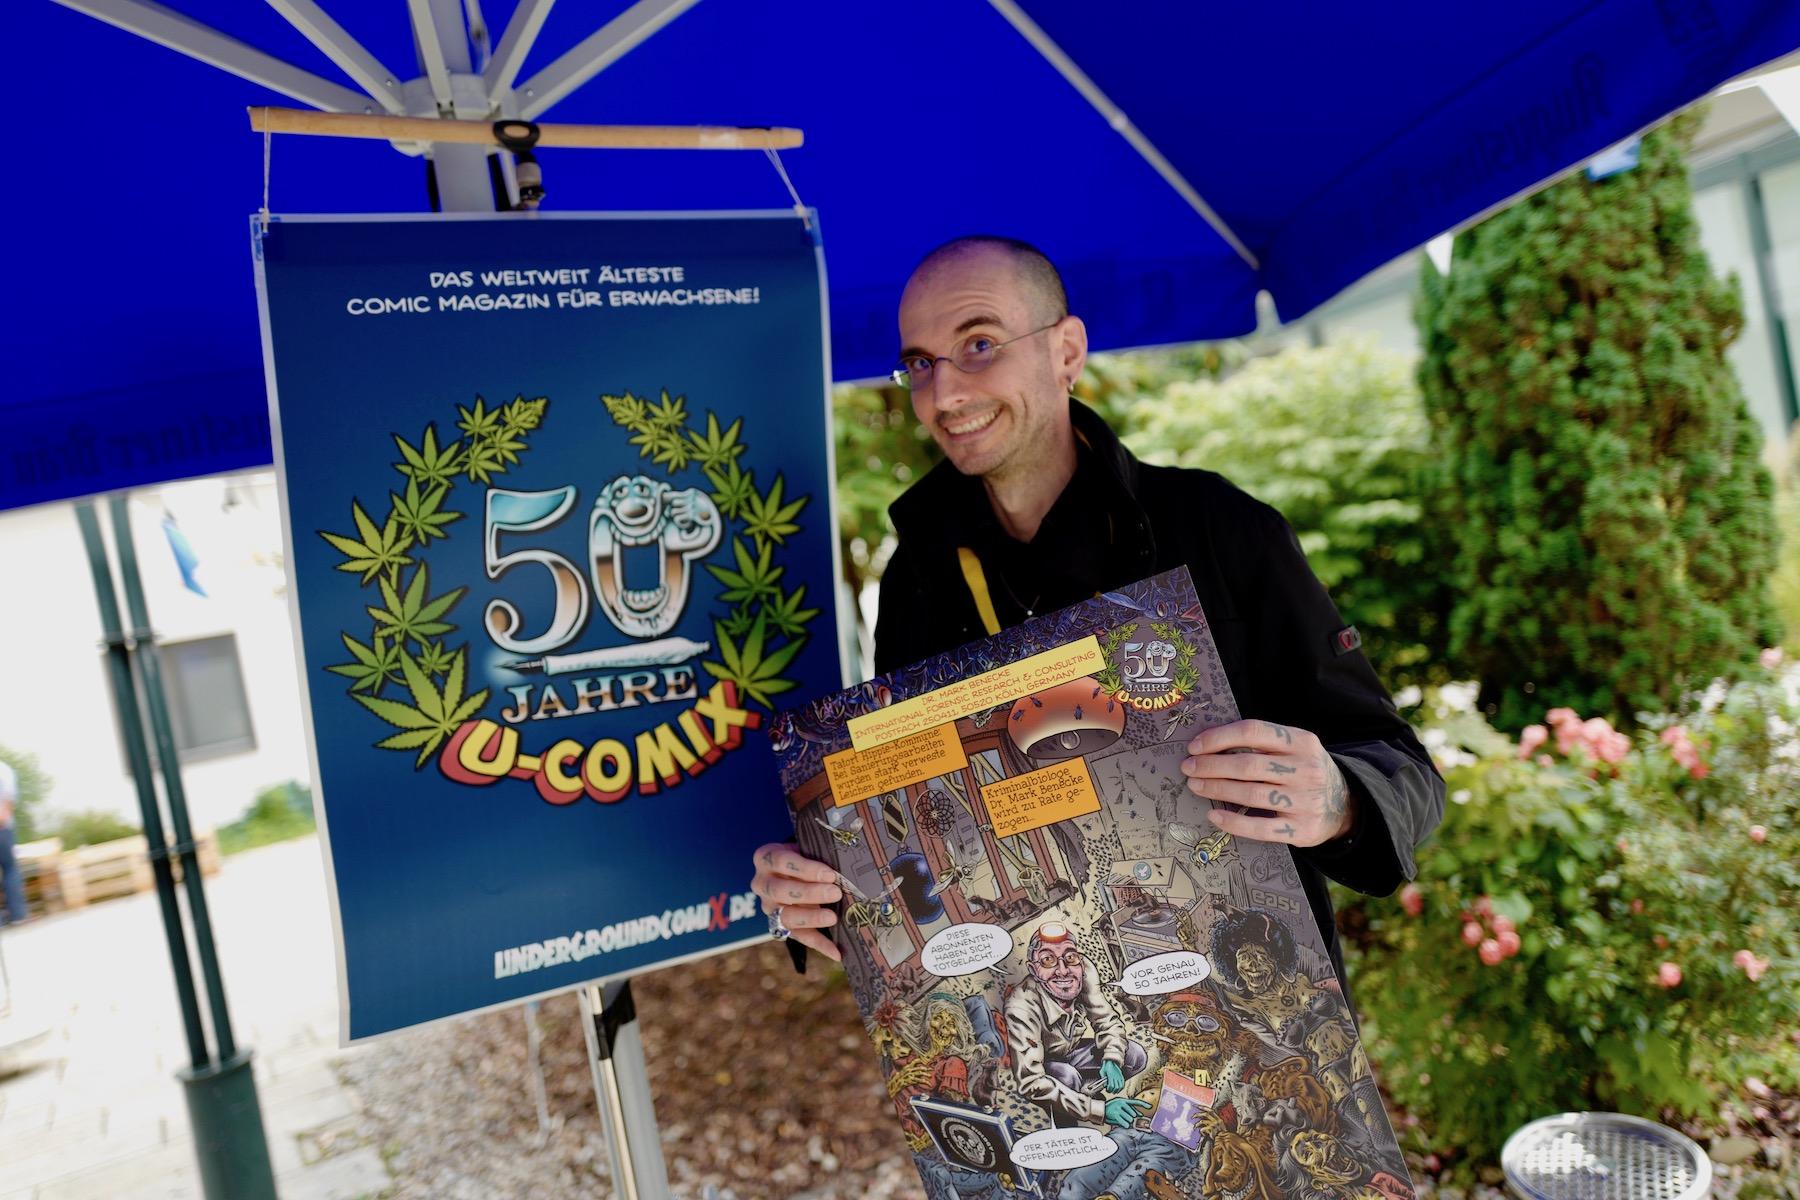 mark_benecke_cfm19_comic_festival_muenchen_u_comix - 11.jpg